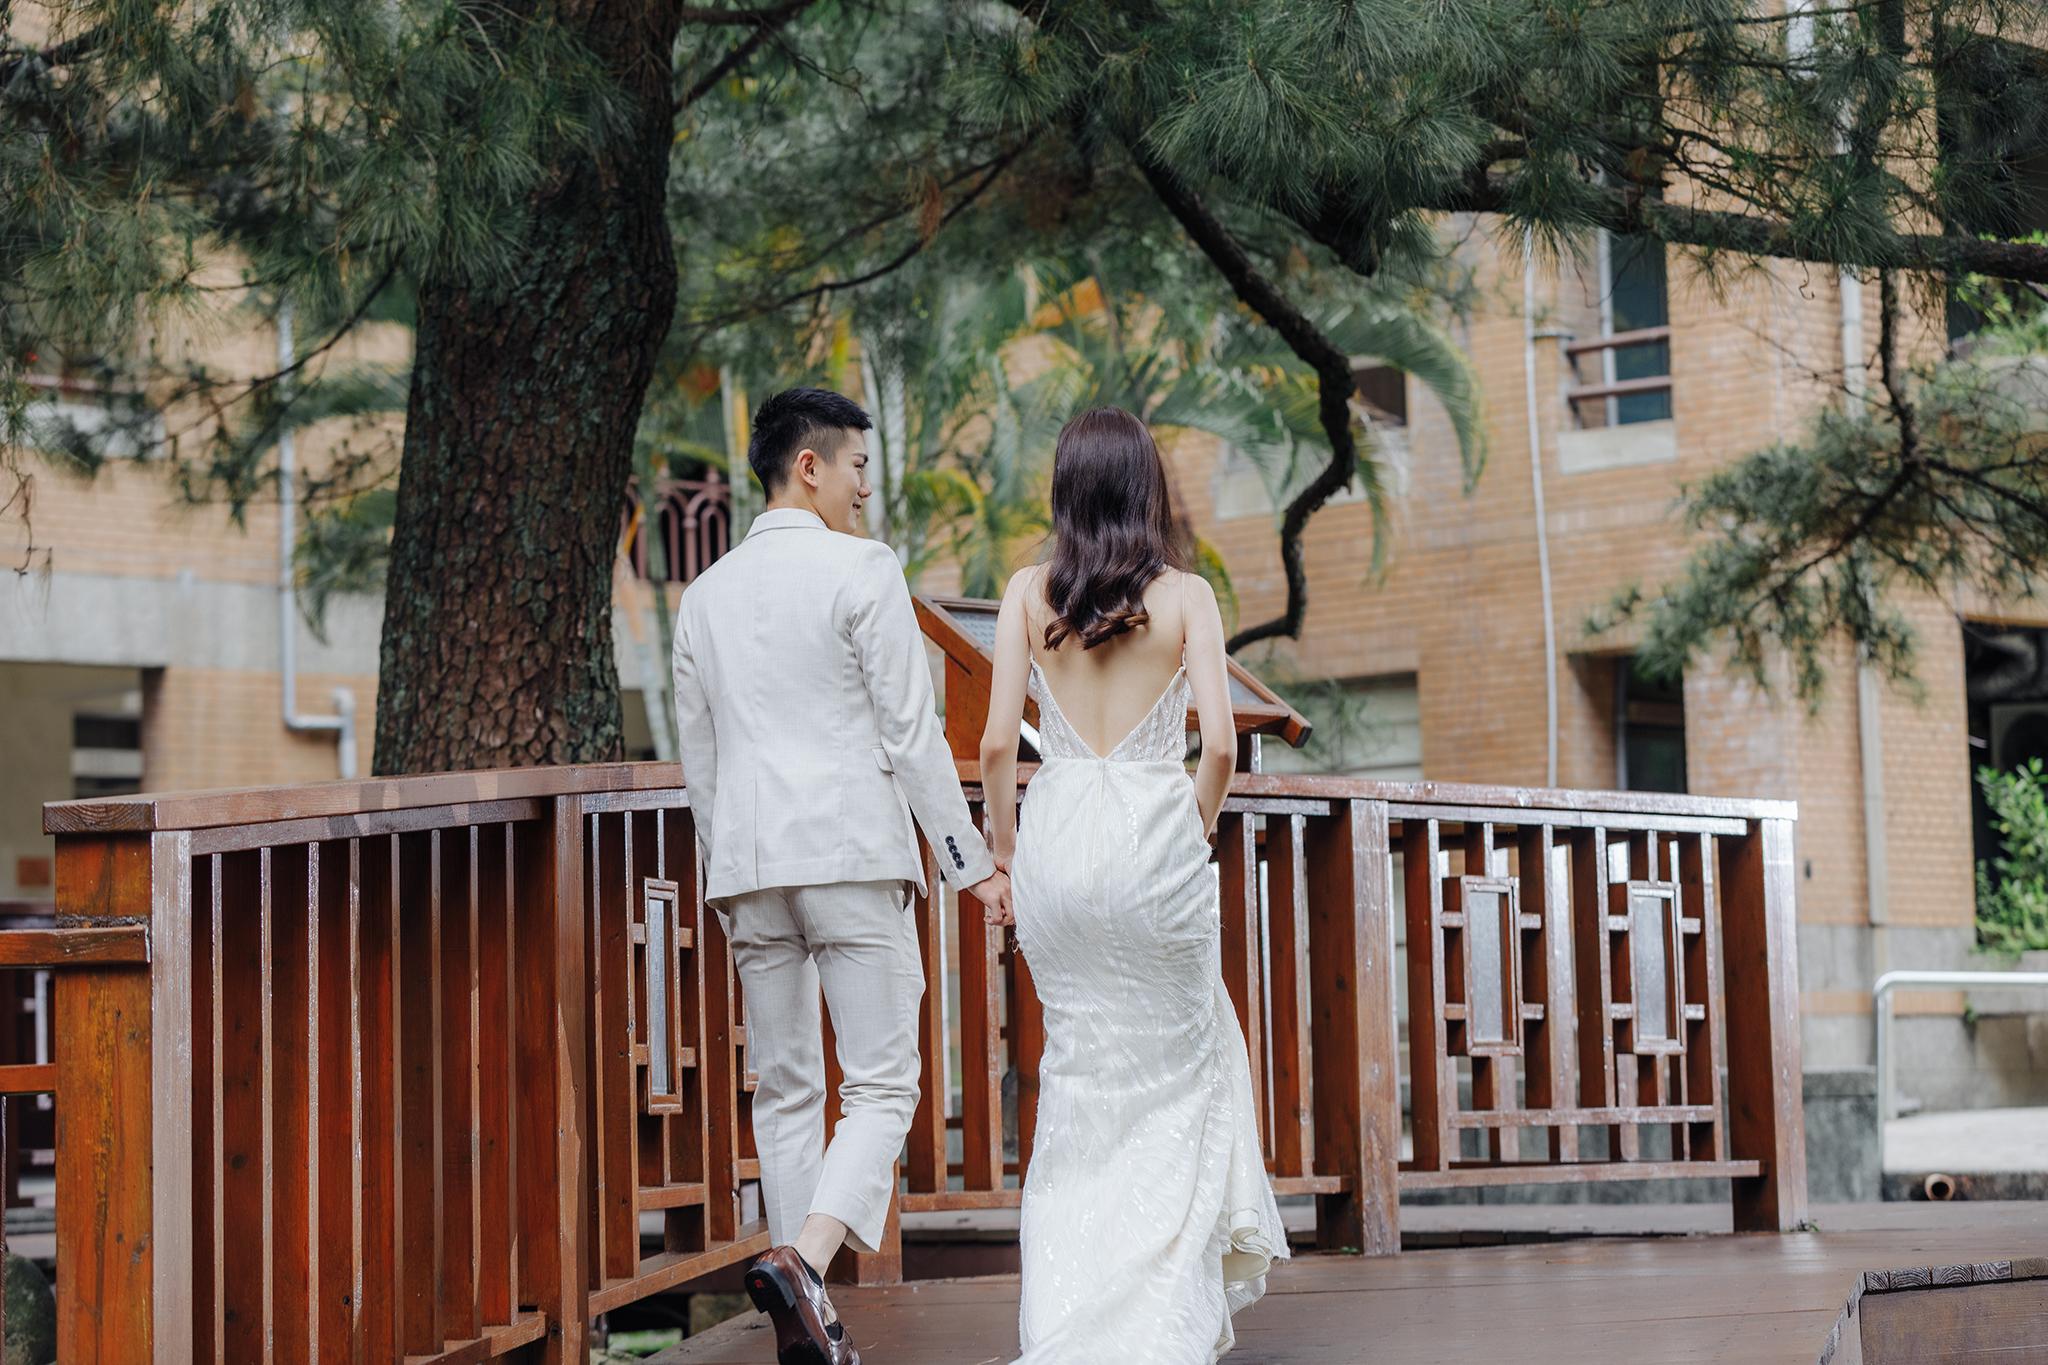 47985583672 5458f1a852 o - 【自主婚紗】+Jared & Arina+